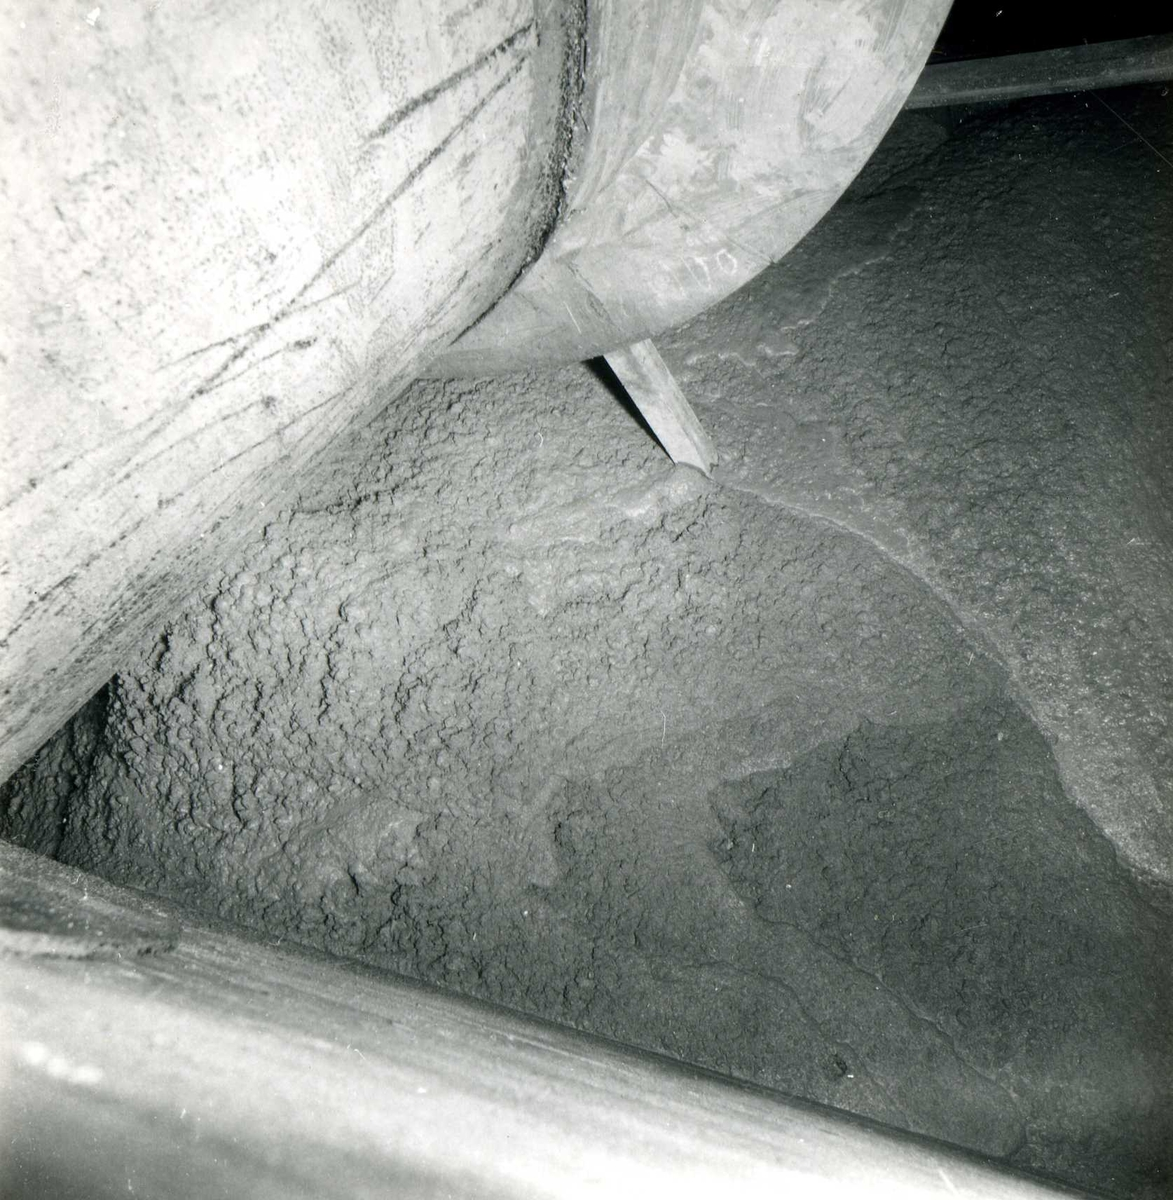 Tilløpstunnel frå Vesås. Støyping i tunnel